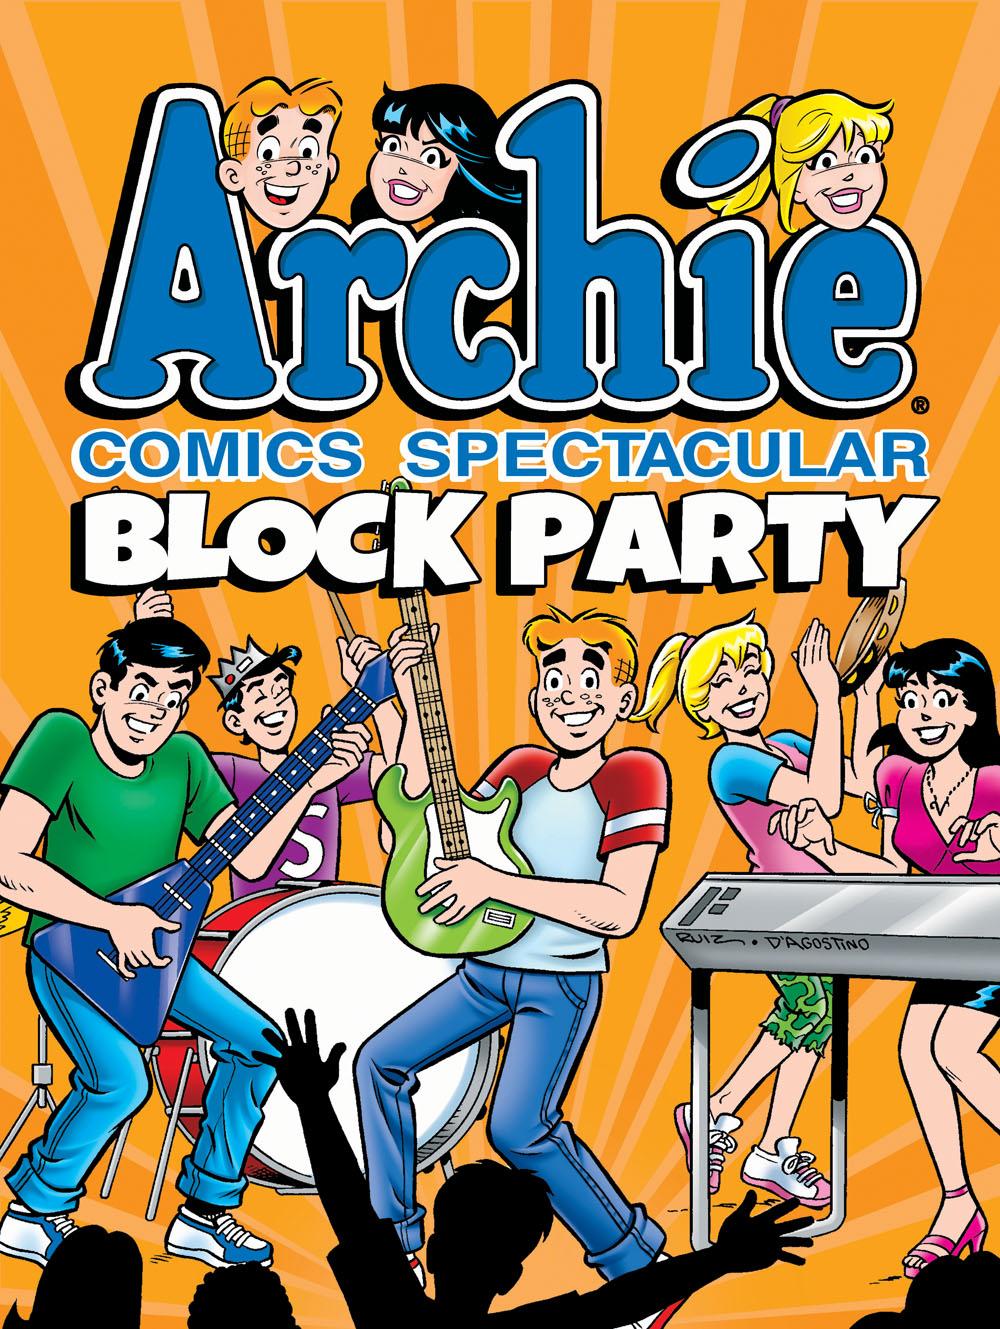 Archie comics archie comics sneak peek of the week major spoilers - Archie Comics Spectacular Block Party Tr